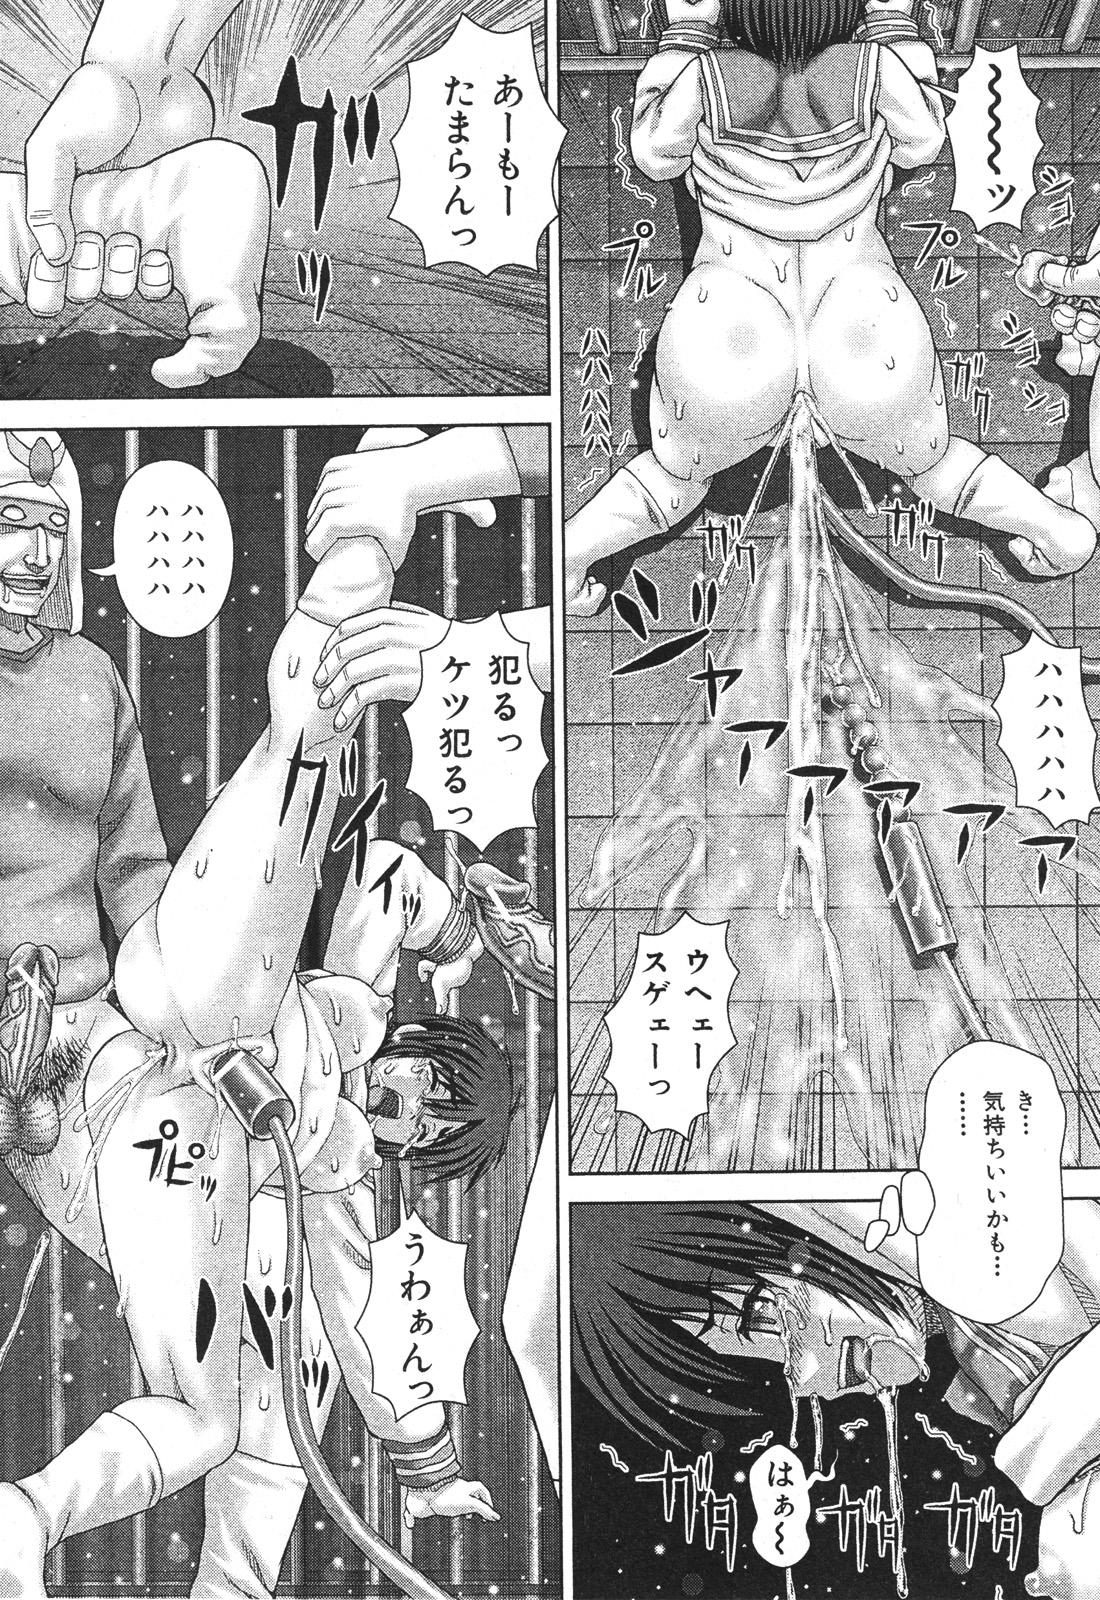 BUSTER COMIC 2010-05 Vol.07 213